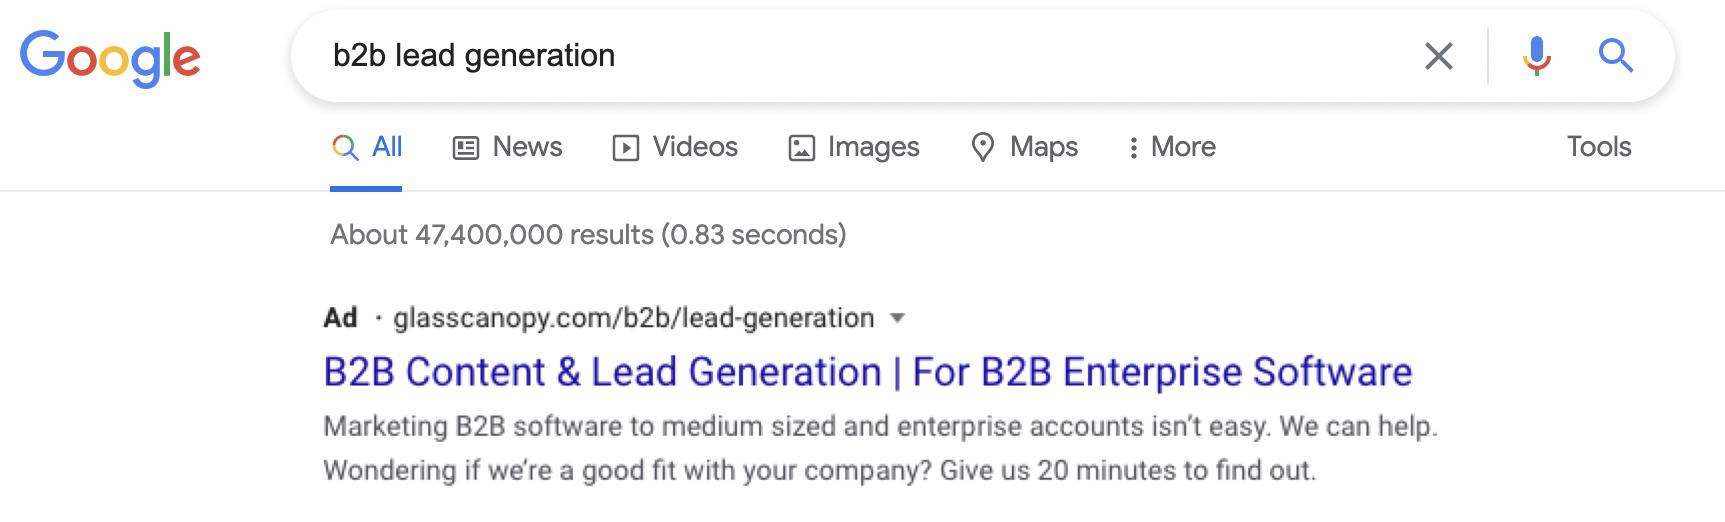 best-platforms-for-b2b-marketing-google-ads